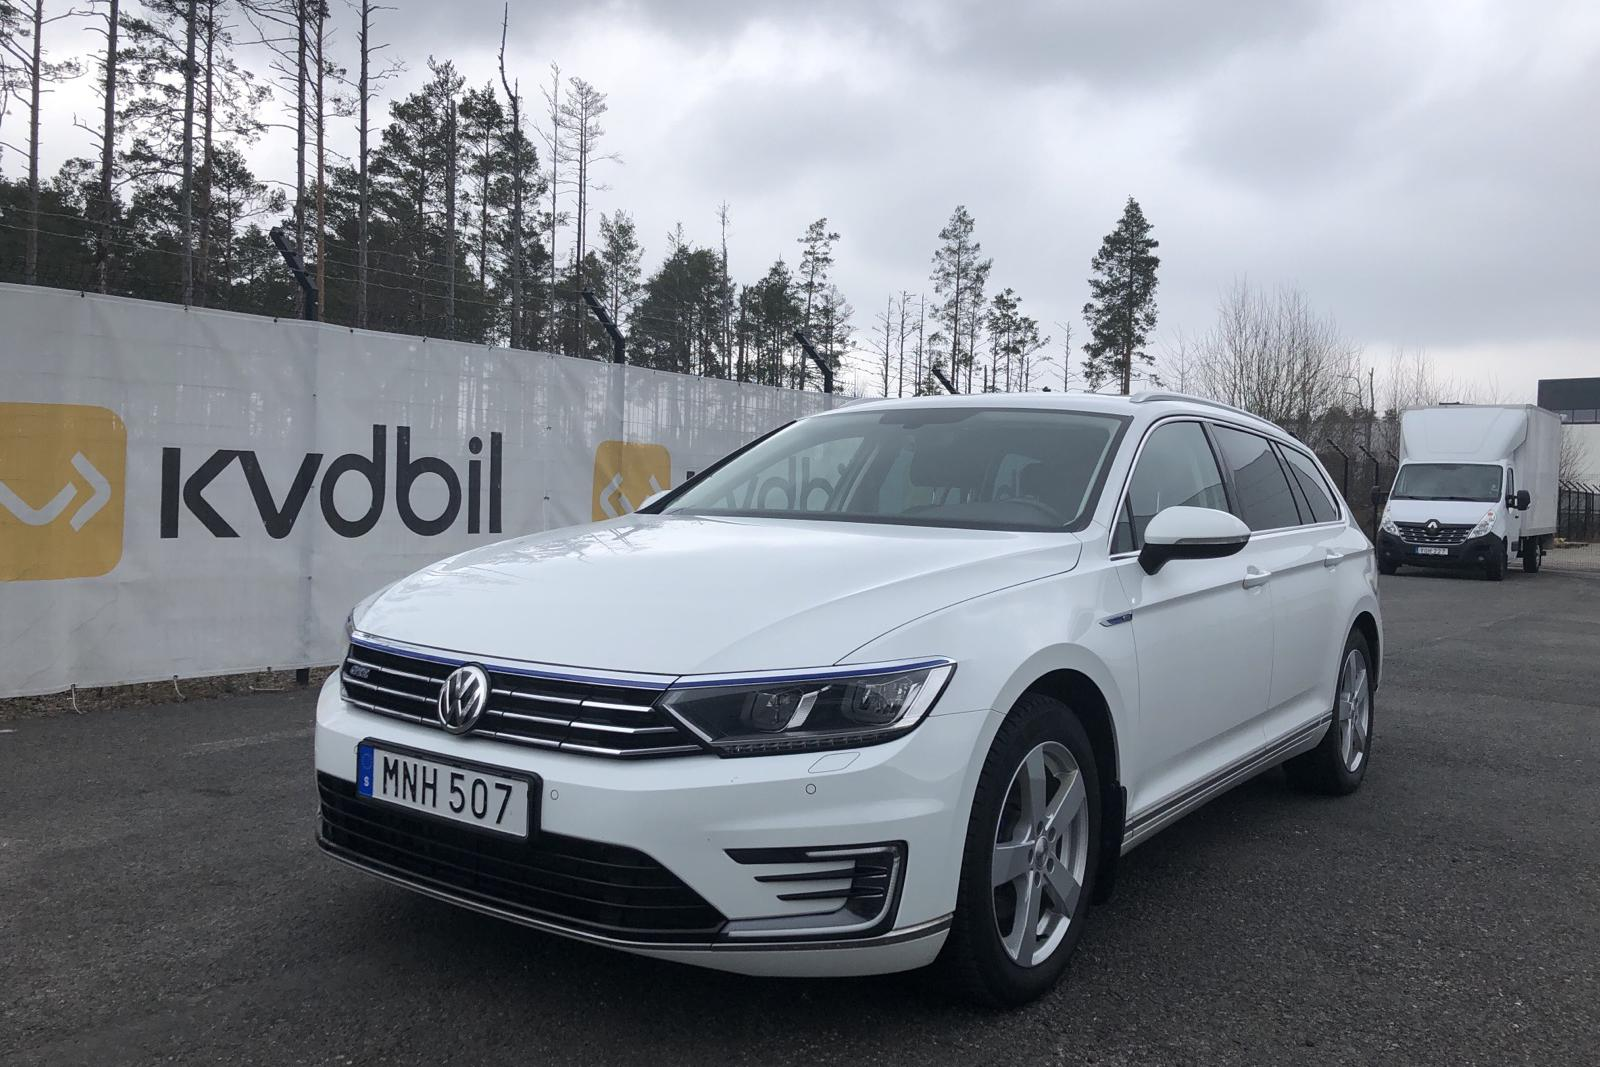 VW Passat 1.4 Plug-in-Hybrid Sportscombi (218hk) - 100 650 km - Automatic - white - 2017